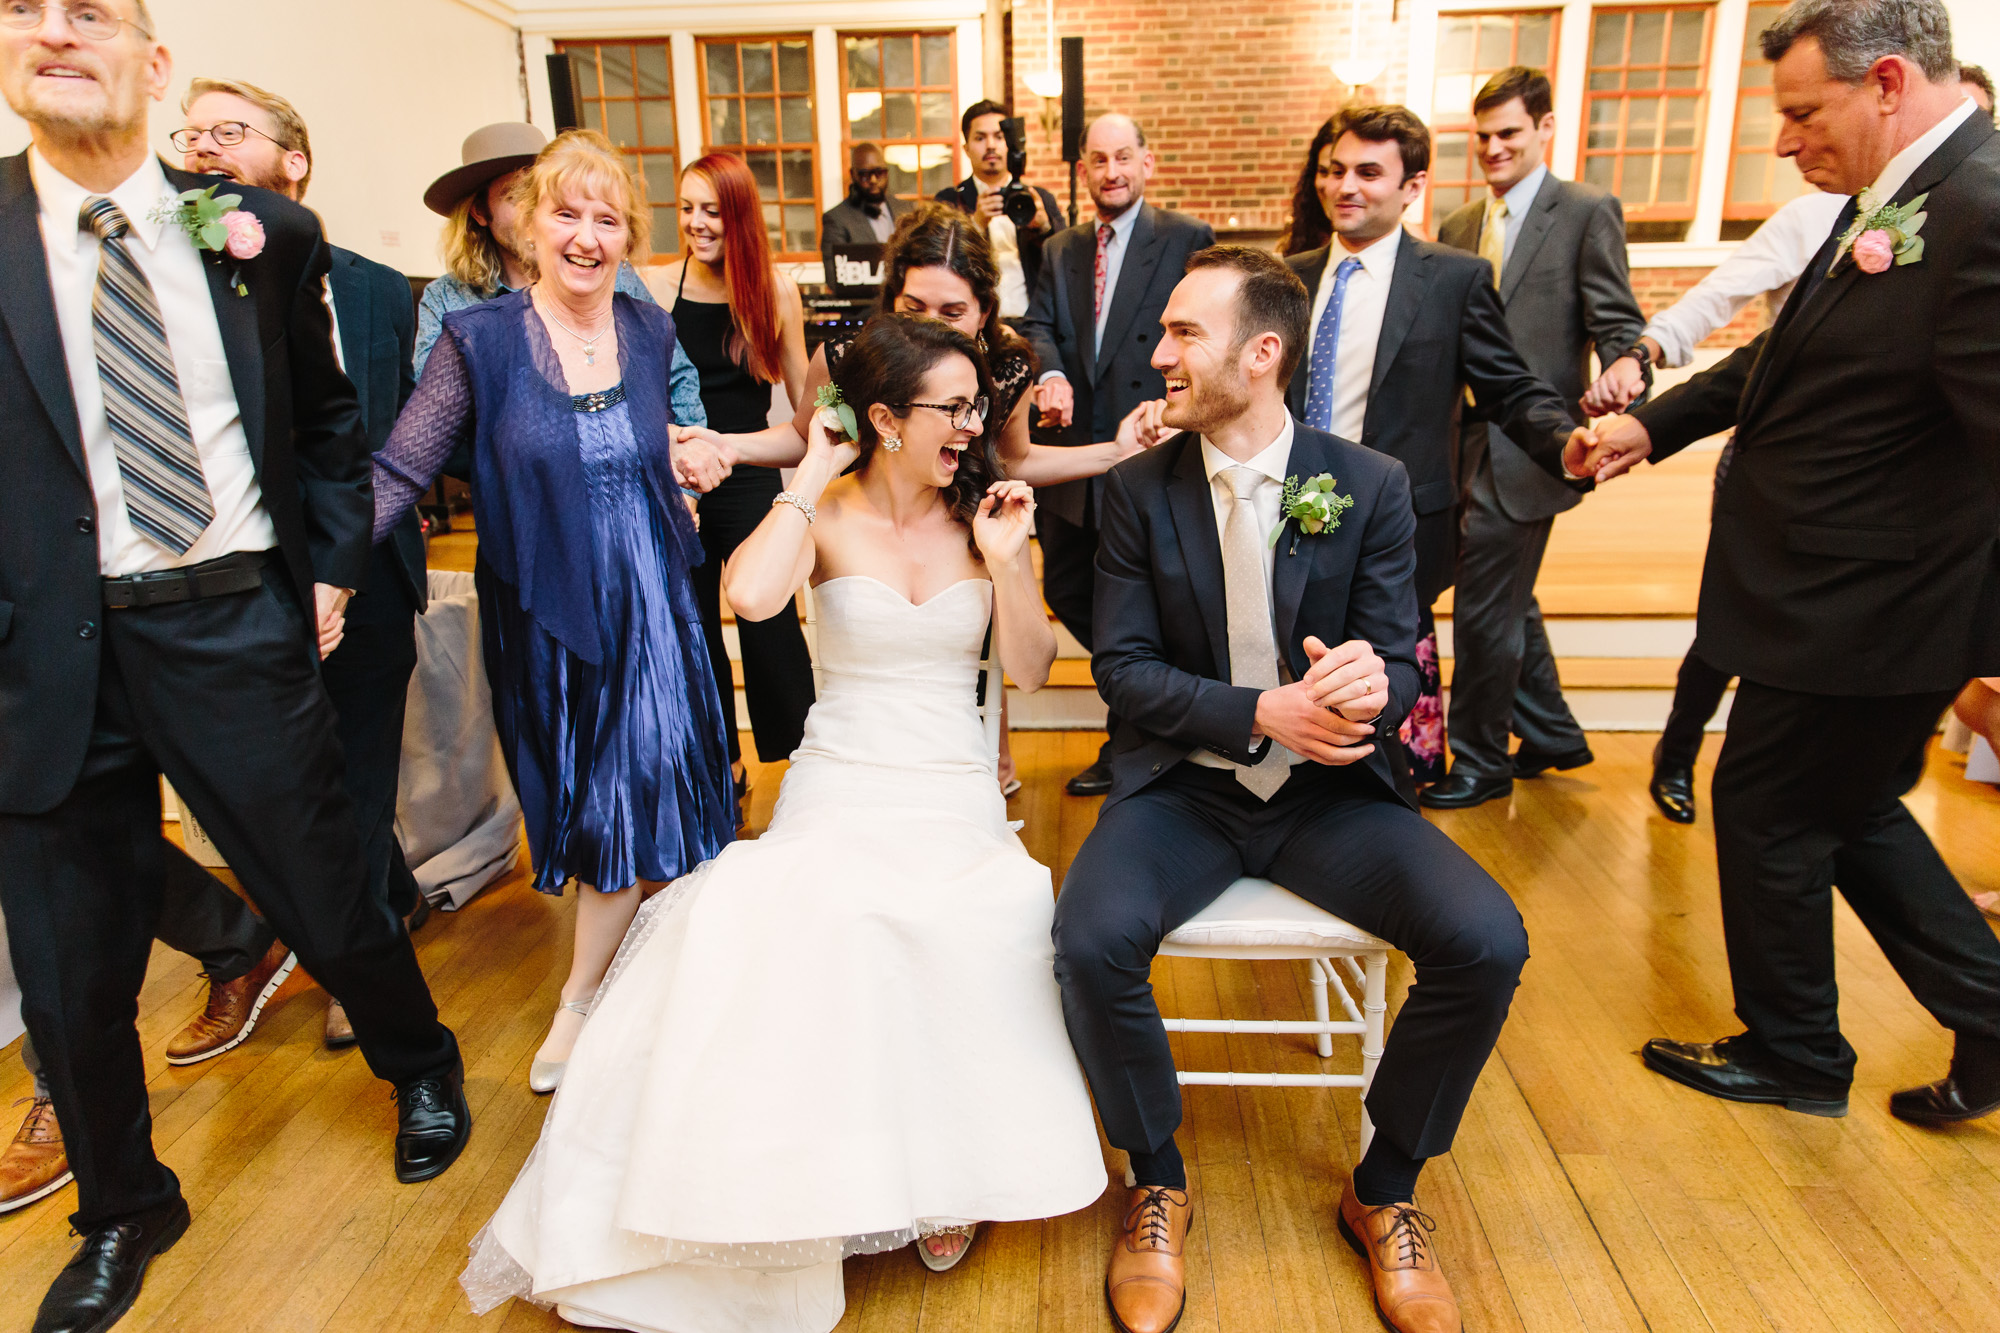 40_Kate_Sam_Picnic_House_Wedding_Brooklyn_NY_Tanya_Salazar_Photography_912.jpg